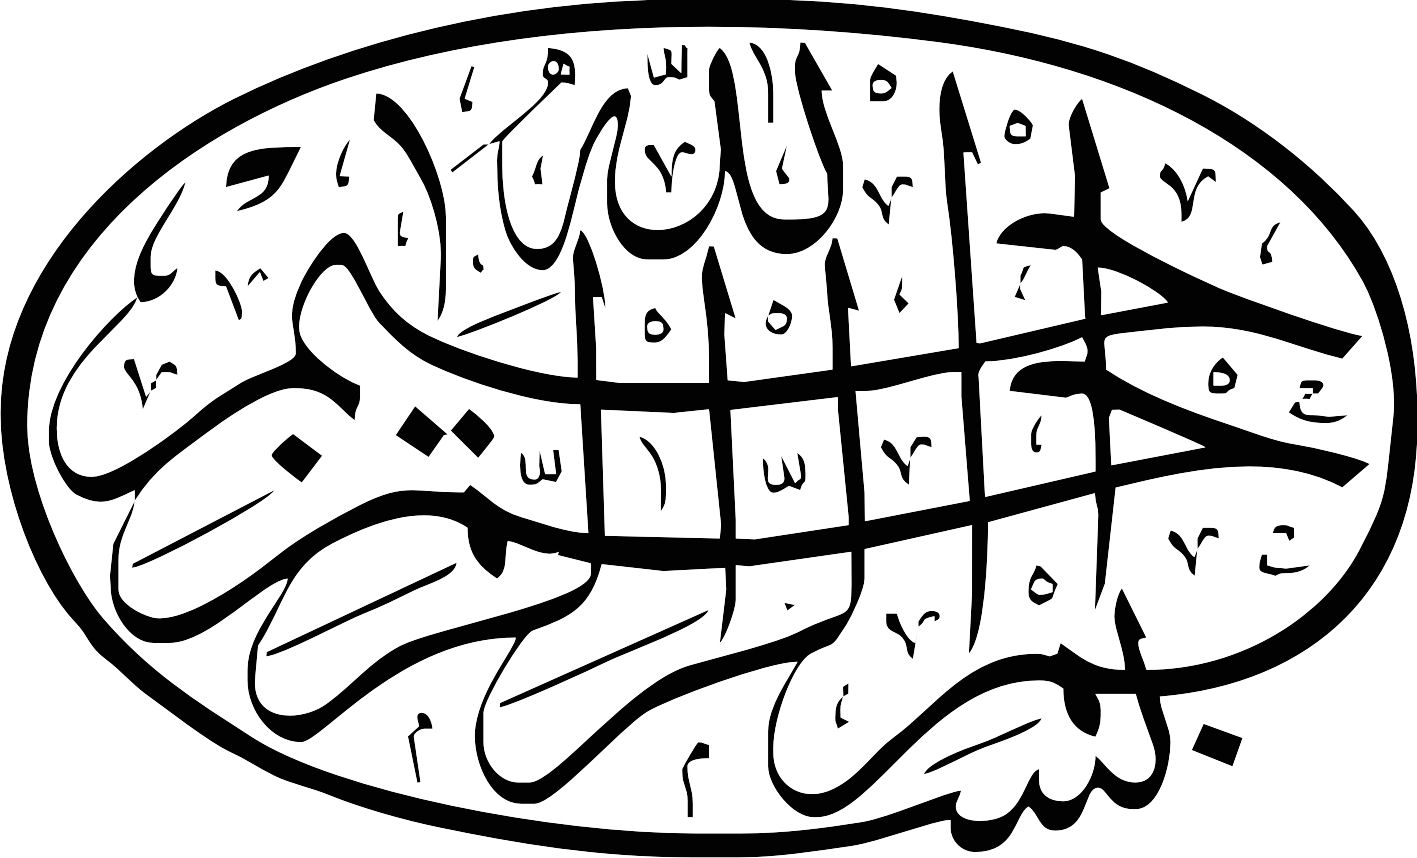 pictures-besmellah-www-mjjz_-ir-214